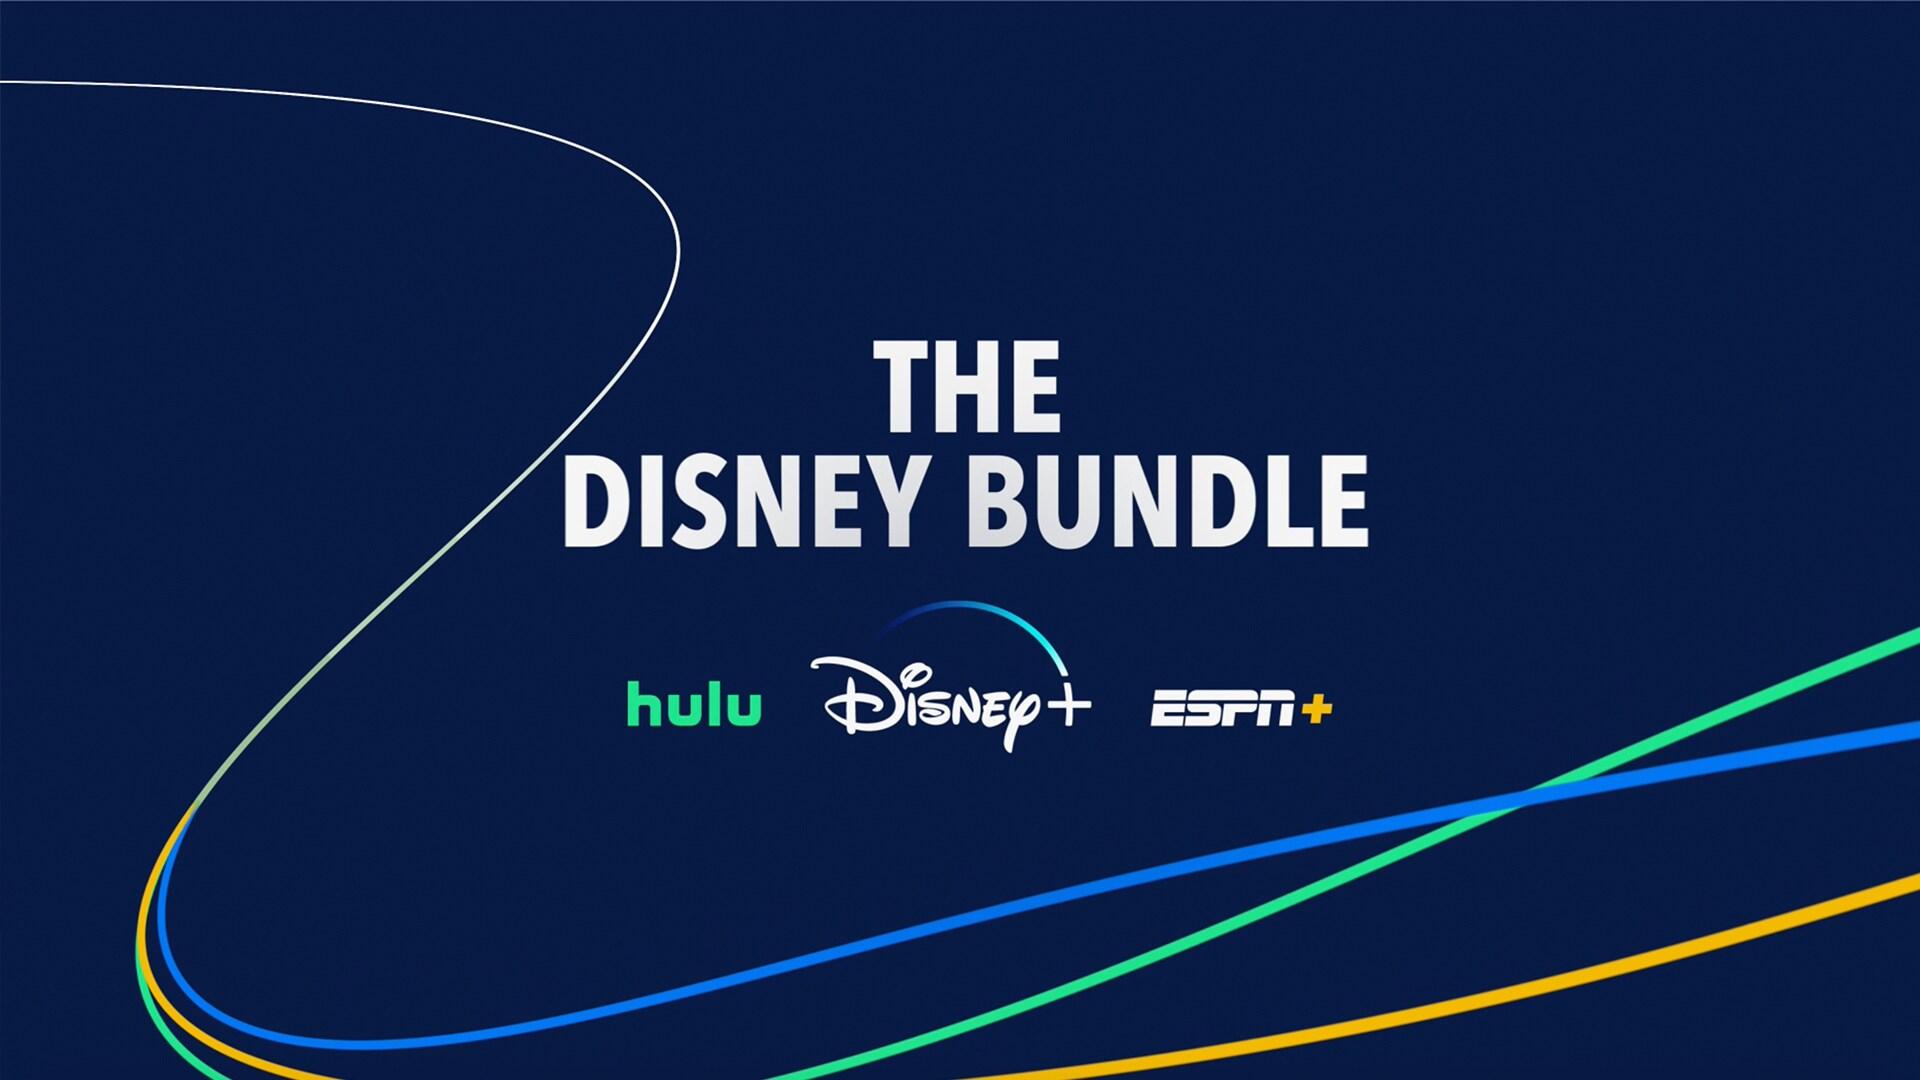 Get Your Stream on With The Disney Bundle | Disney+ | Hulu | ESPN+